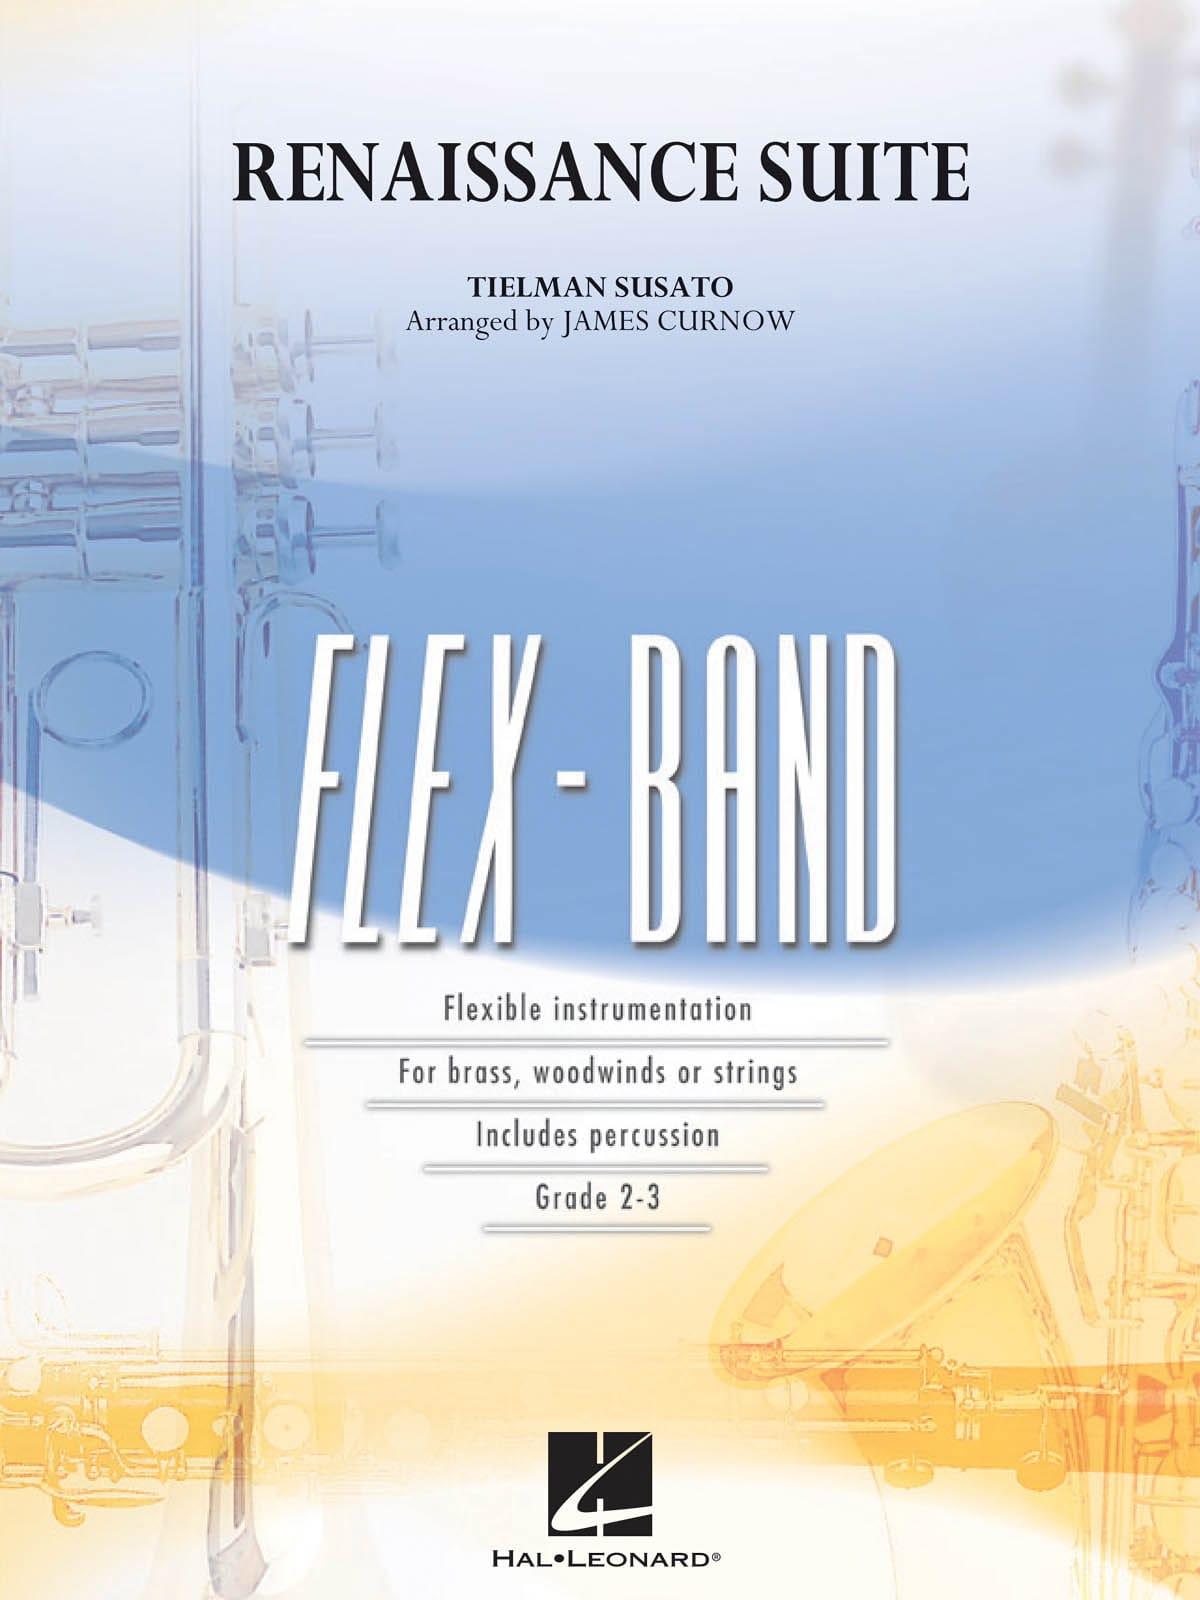 Renaissance Suite - FlexBand - Tielman Susato - laflutedepan.com